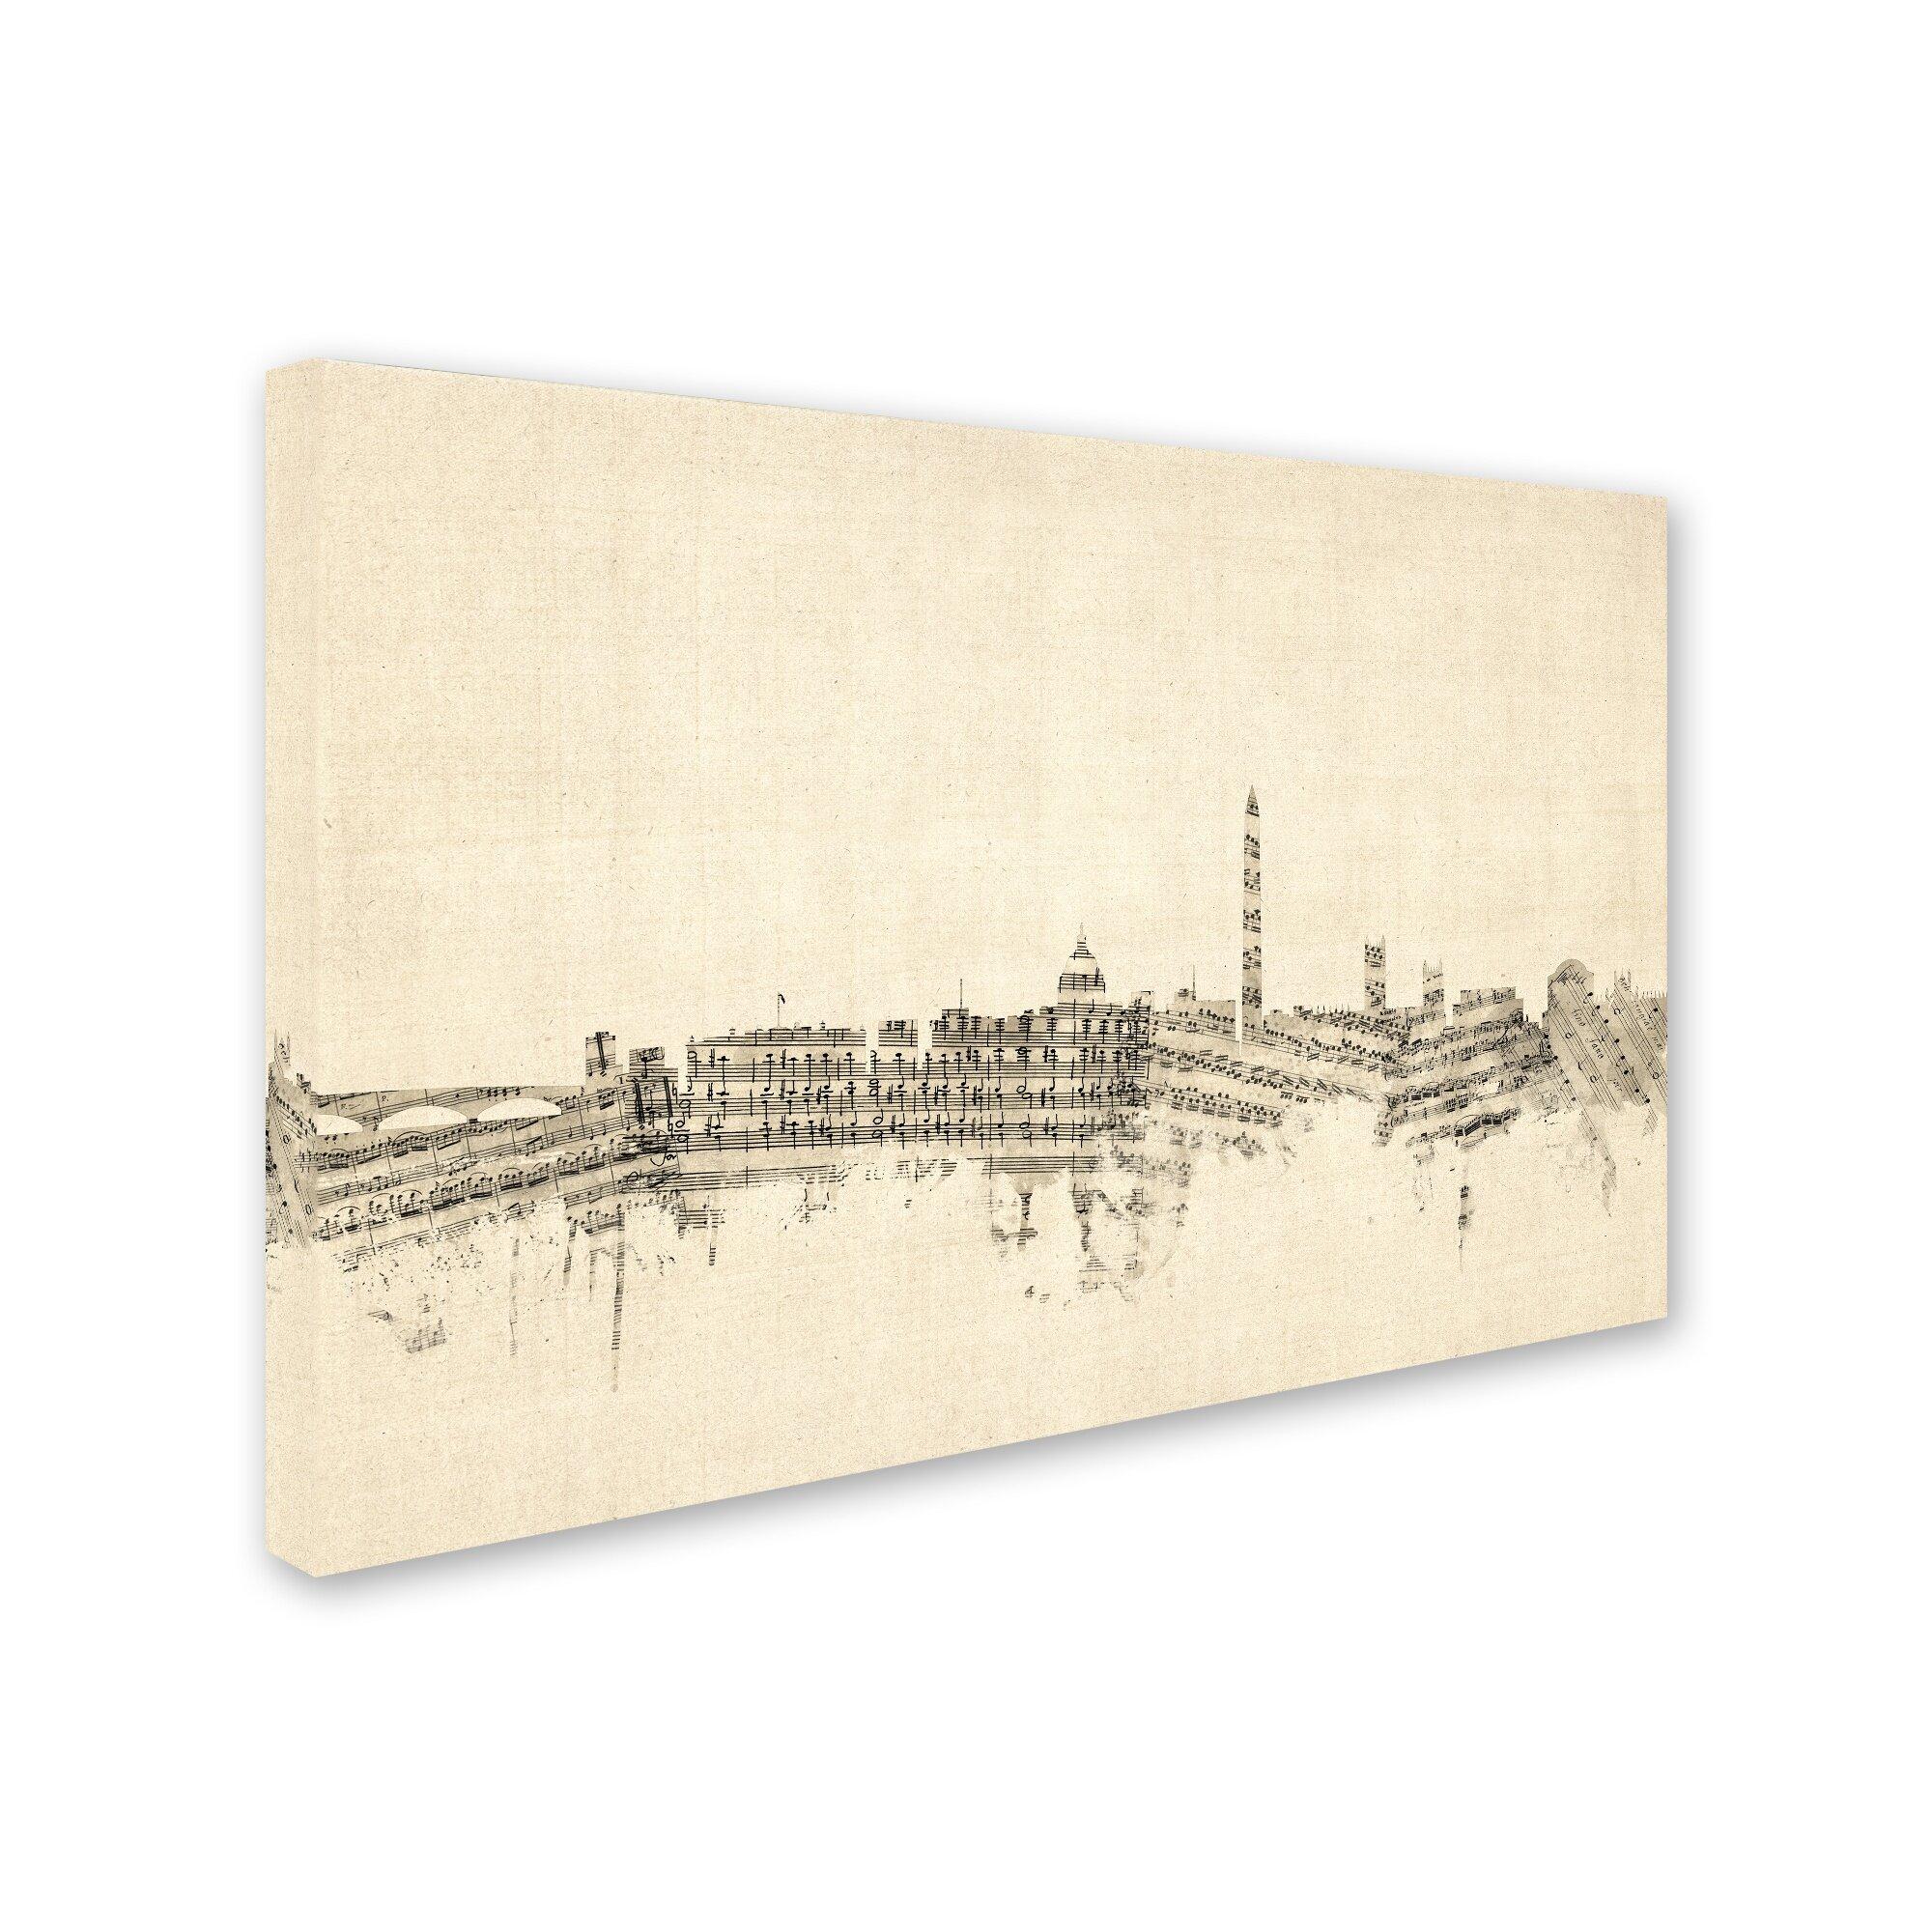 Trademark Art Washington Dc Skyline Sheet Music By Michael Tompsett Graphic Art On Wrapped